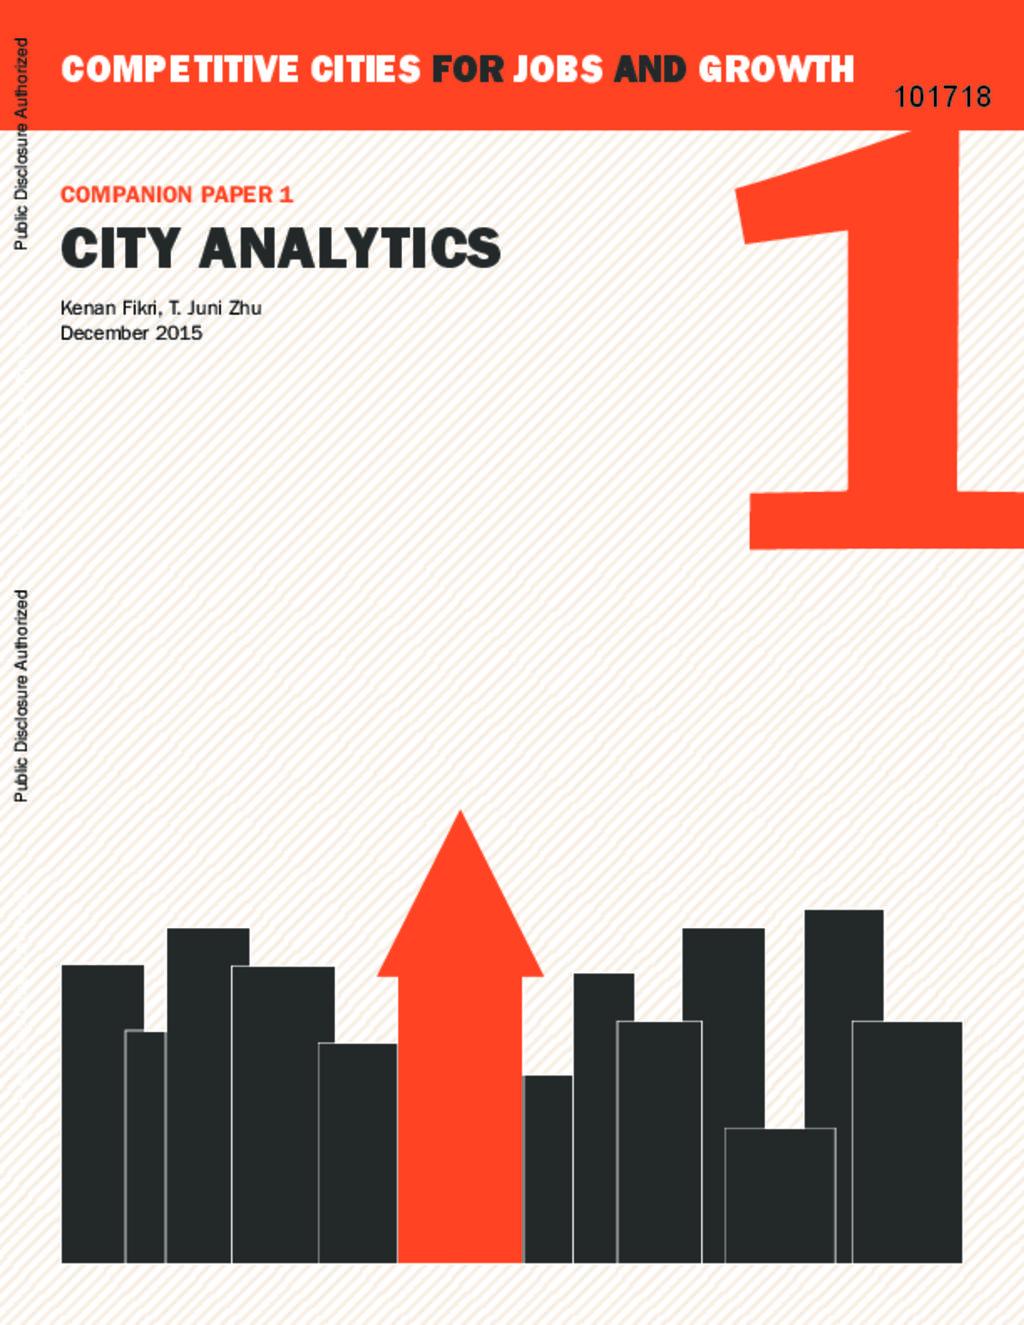 City analystics